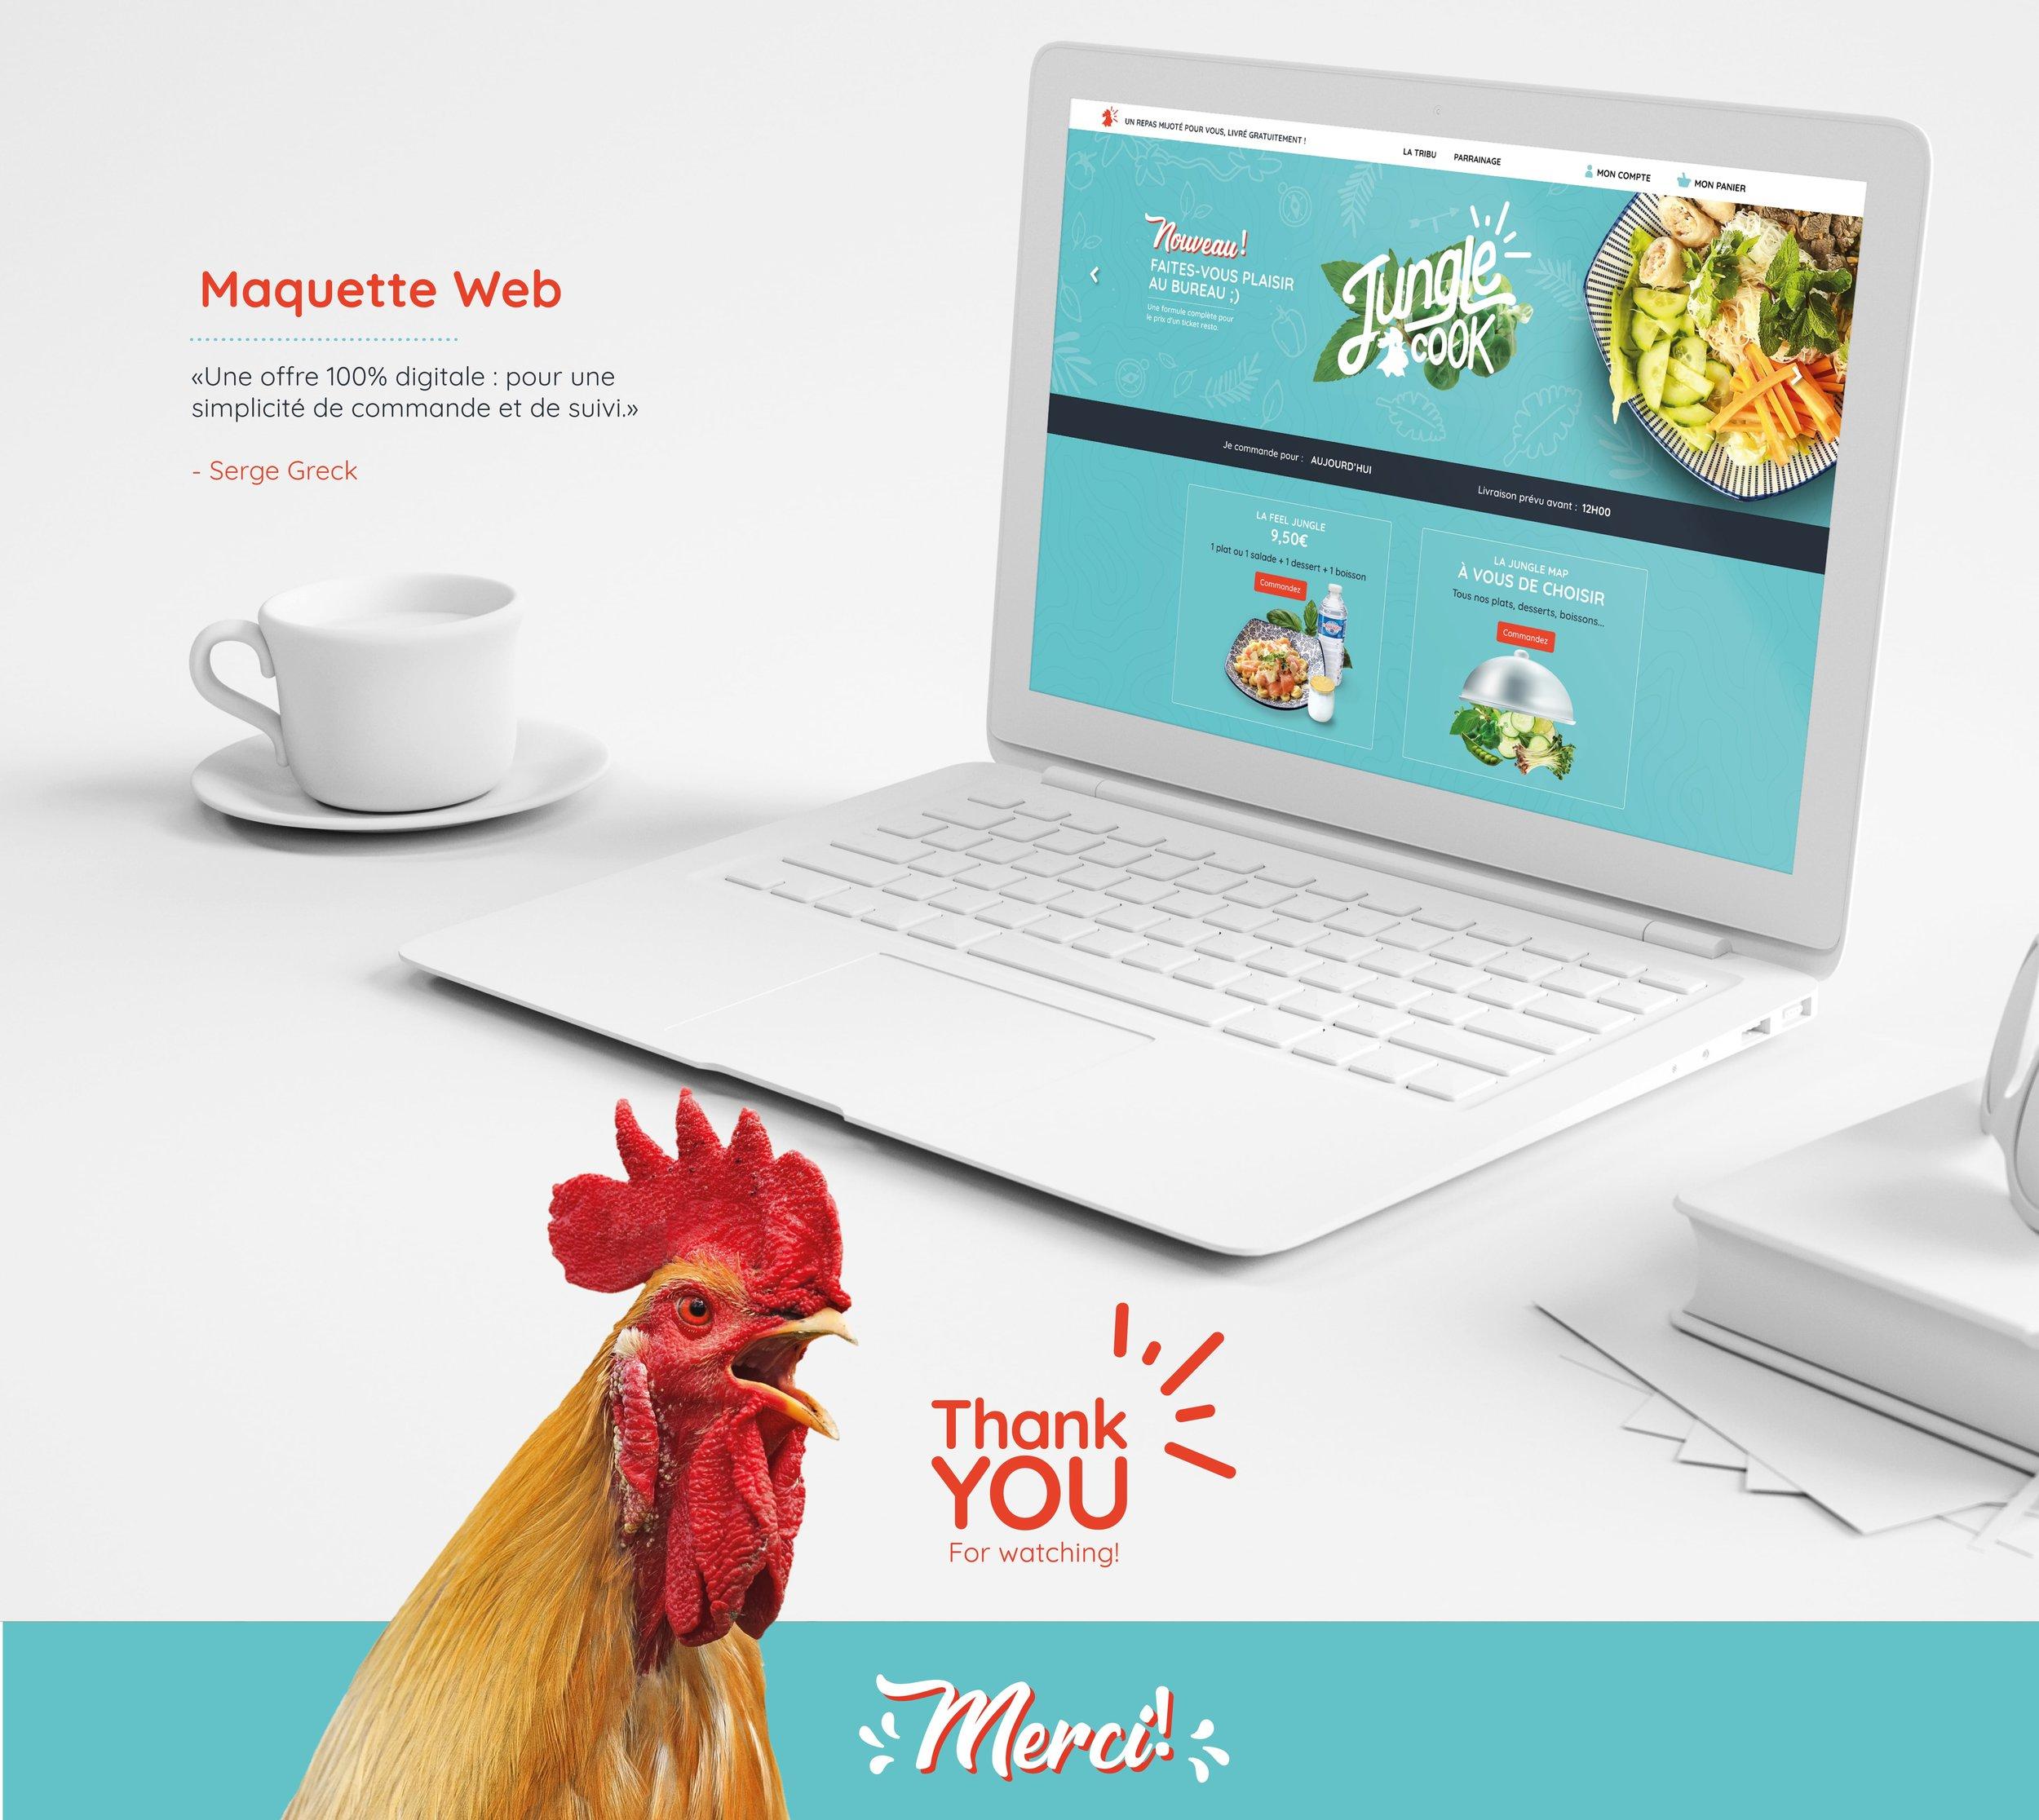 jungle_cook_7-web_coverfacebook_maquette-site-internet_digital_simplicite.jpg